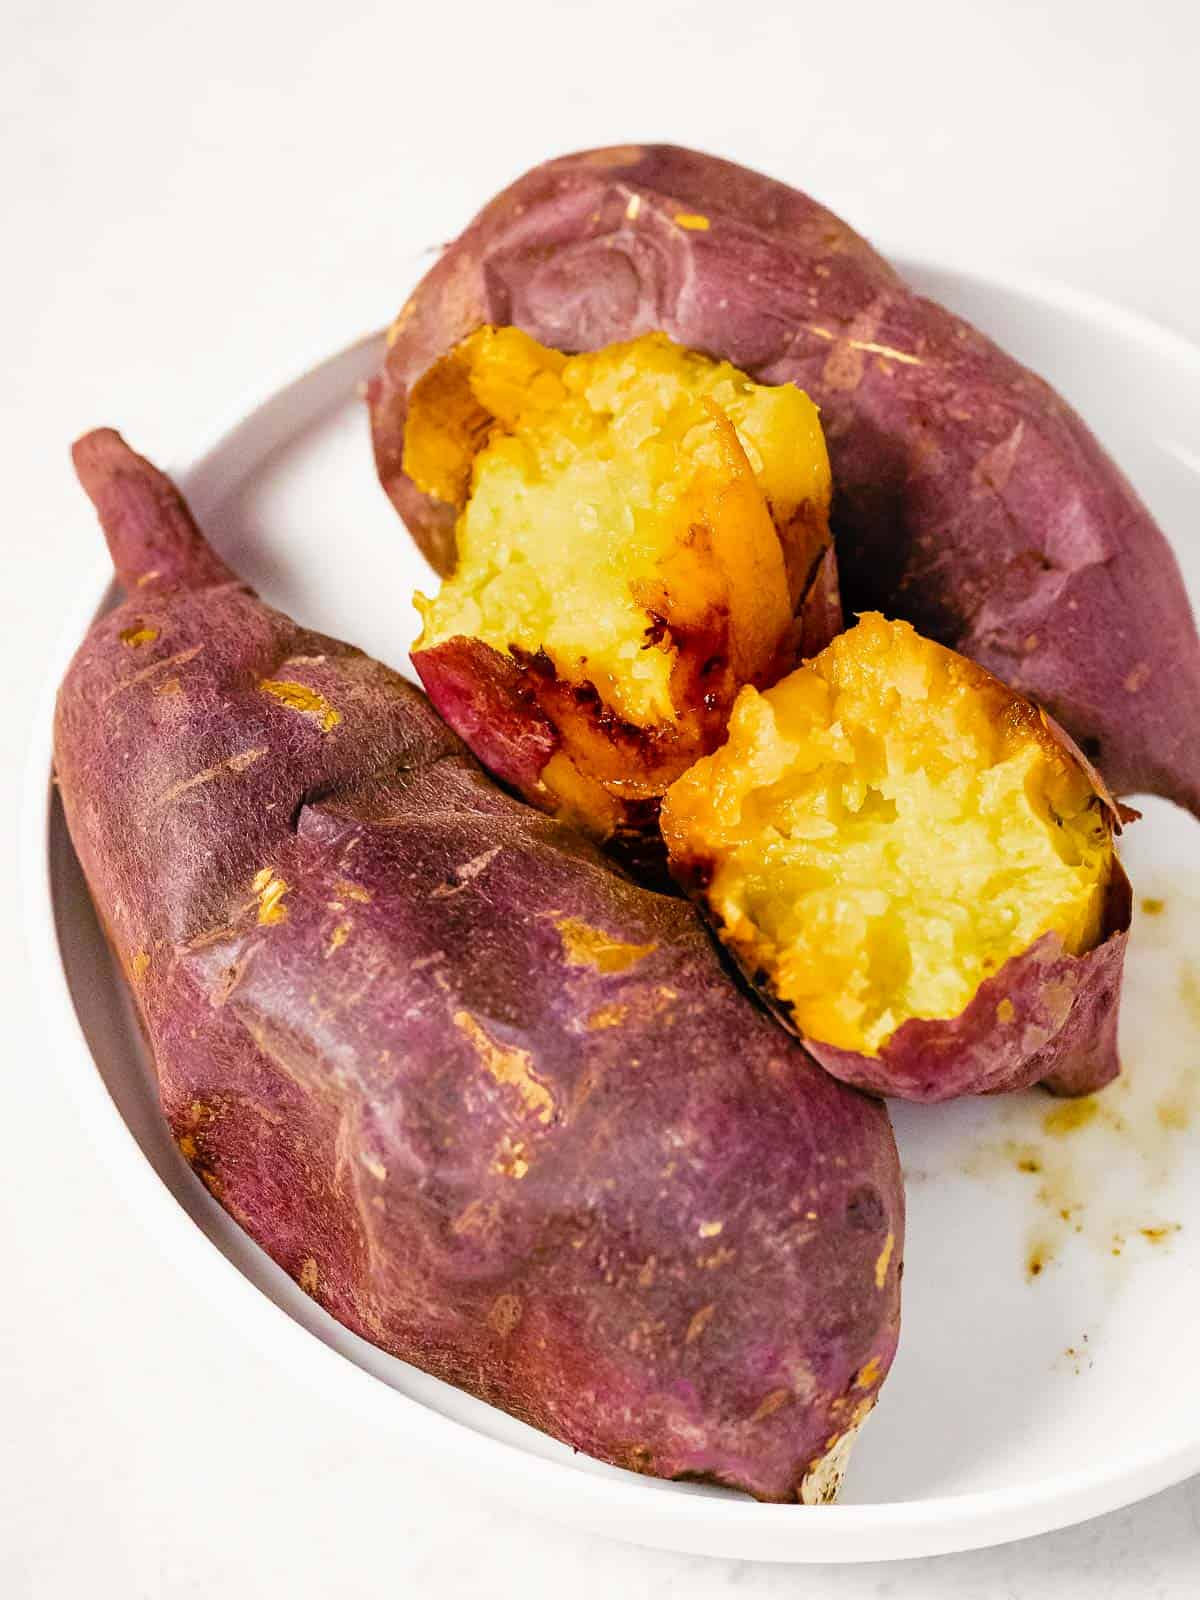 Baked Korean sweet potatoes also called gungoguma 군고구마 on a white plate.